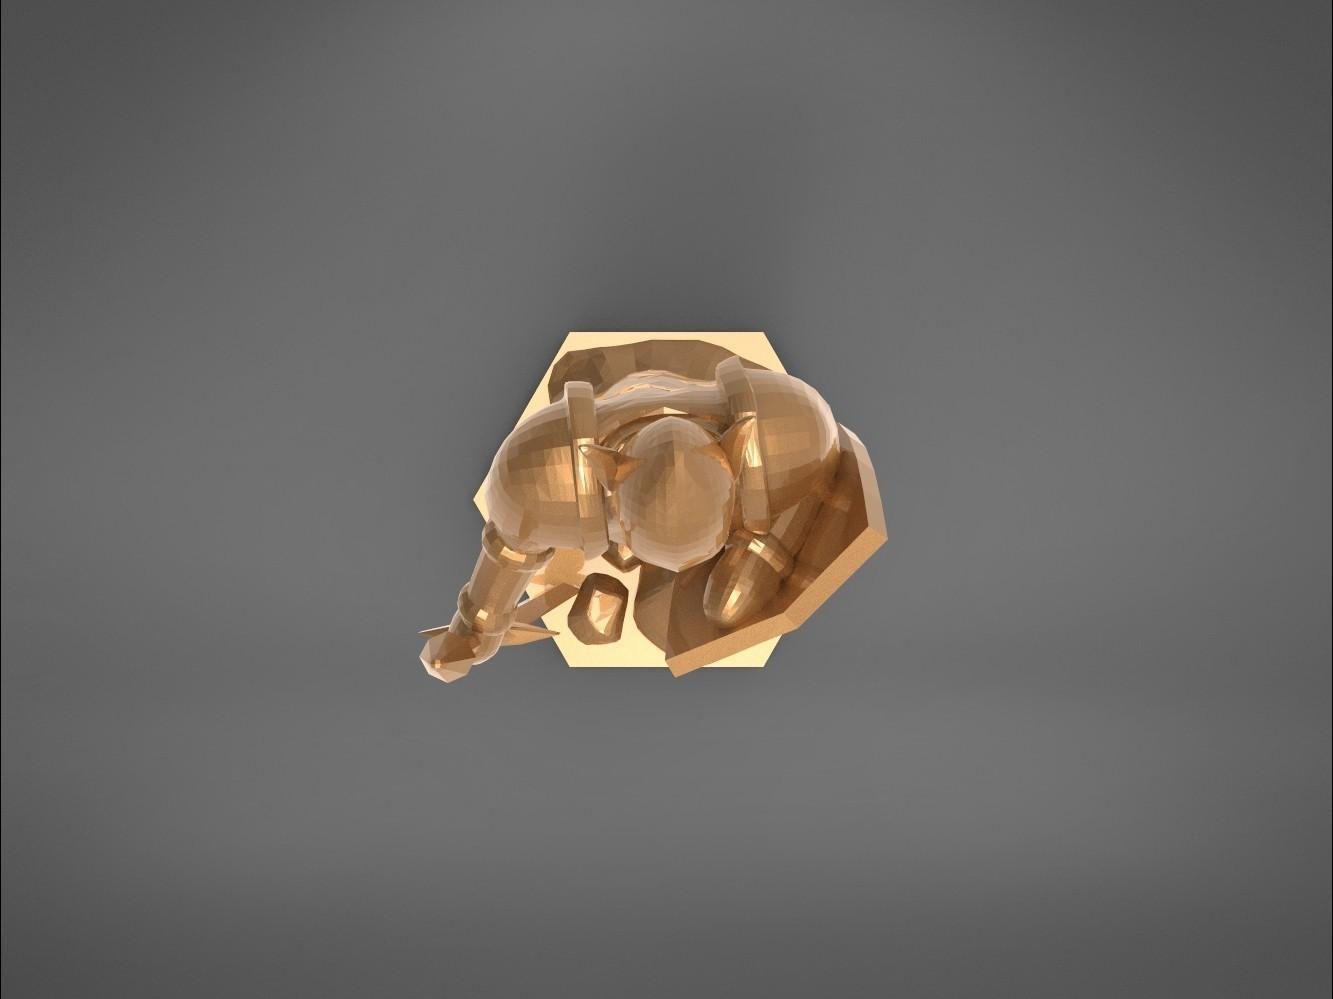 Warrior-top_perspective.355.jpg Download STL file ELF WARRIOR CHARACTER GAME FIGURE 3D print model • Object to 3D print, 3D-mon